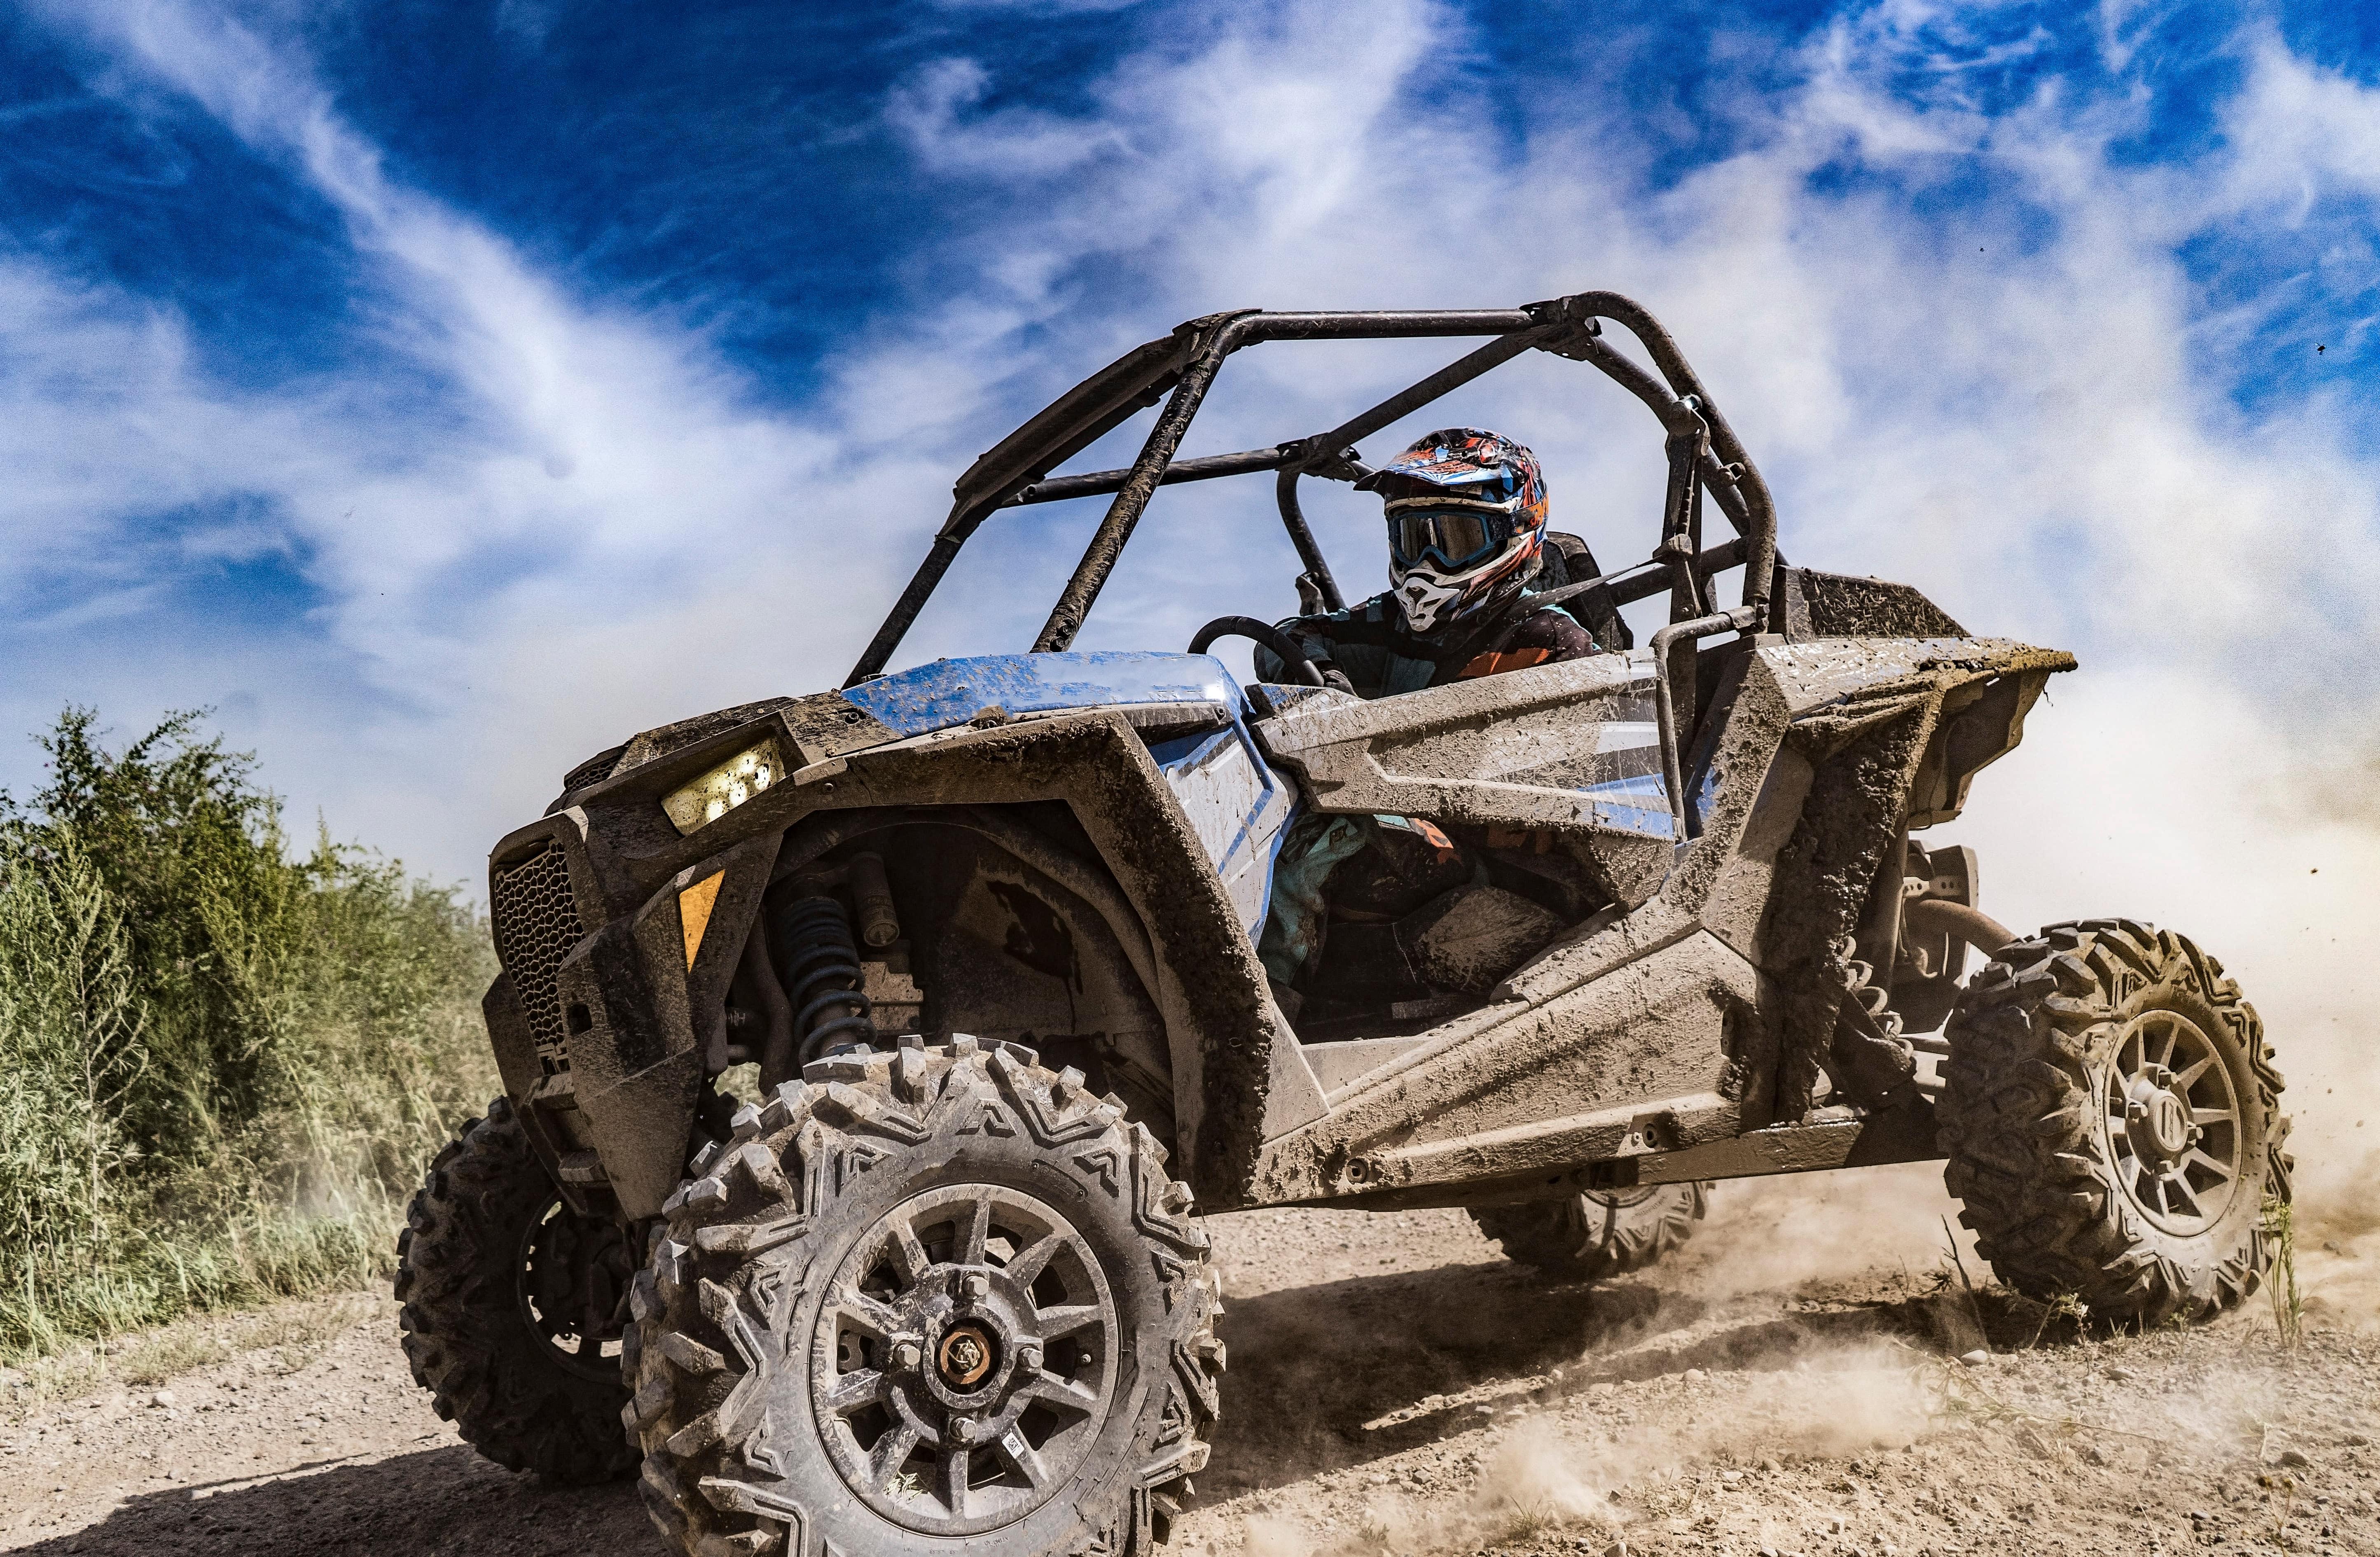 atv-adventure-buggy-extreme-ride-on